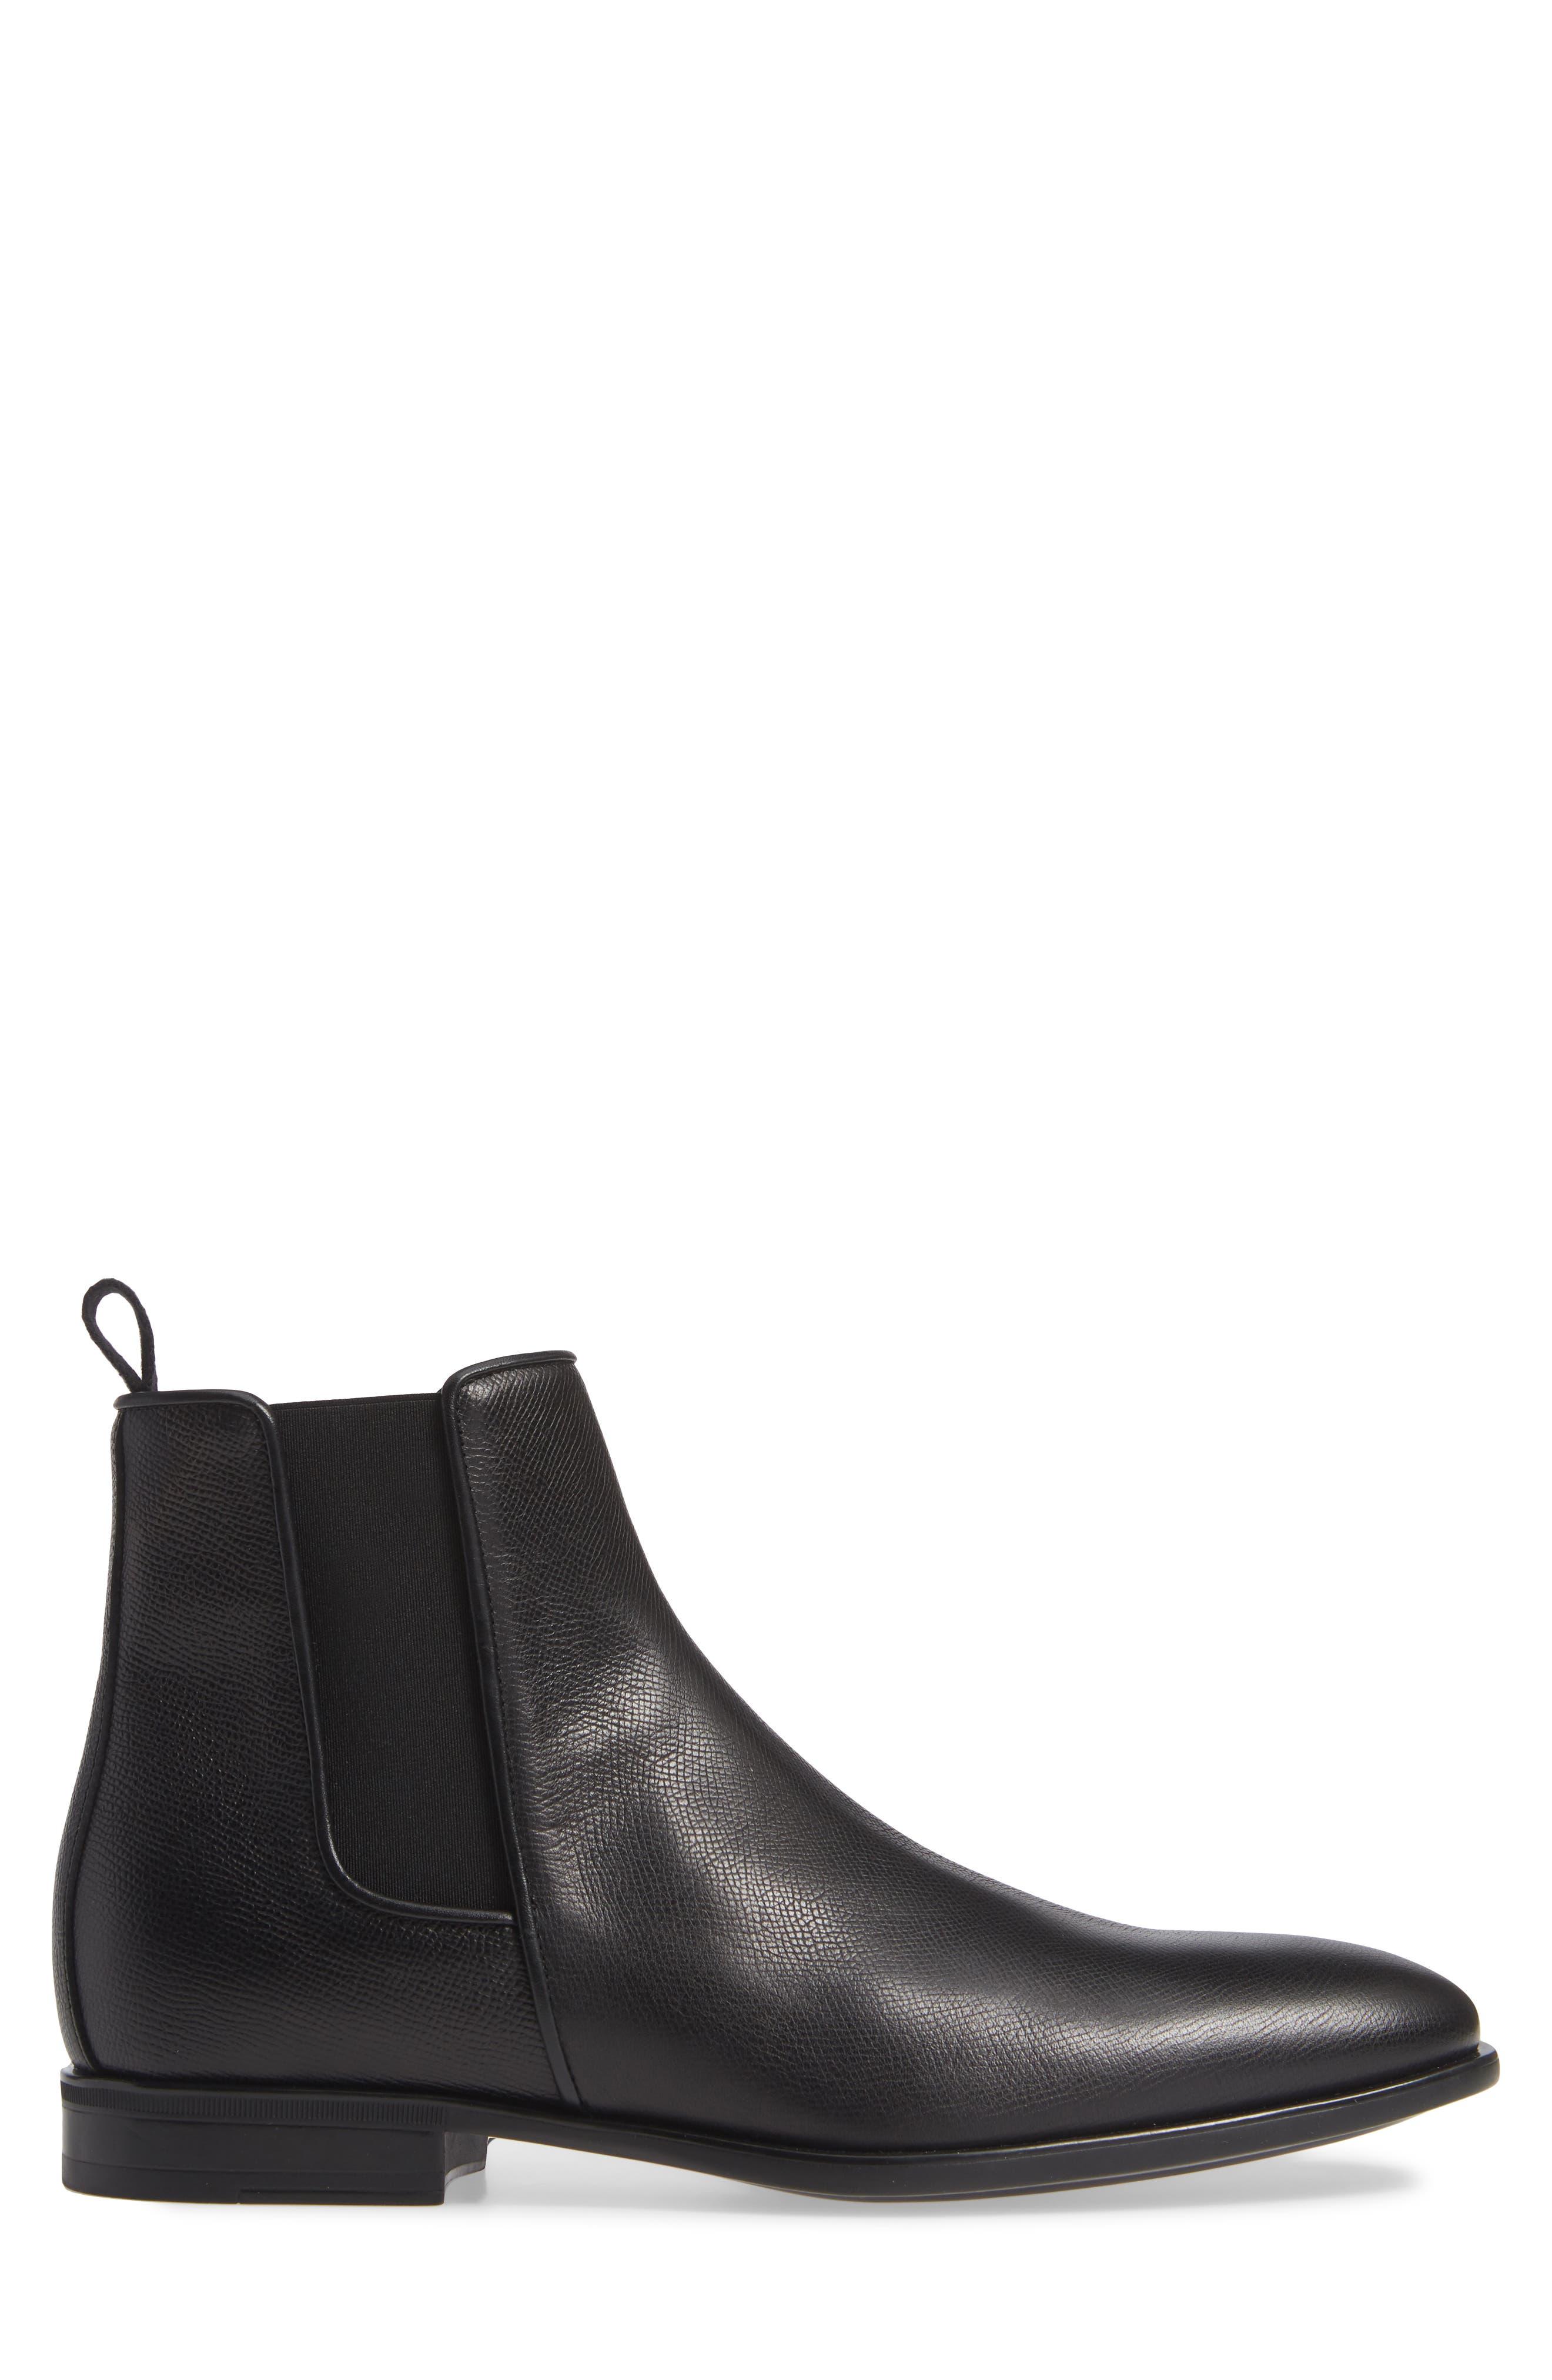 'Adrian' Weatherproof Chelsea Boot,                             Alternate thumbnail 3, color,                             003